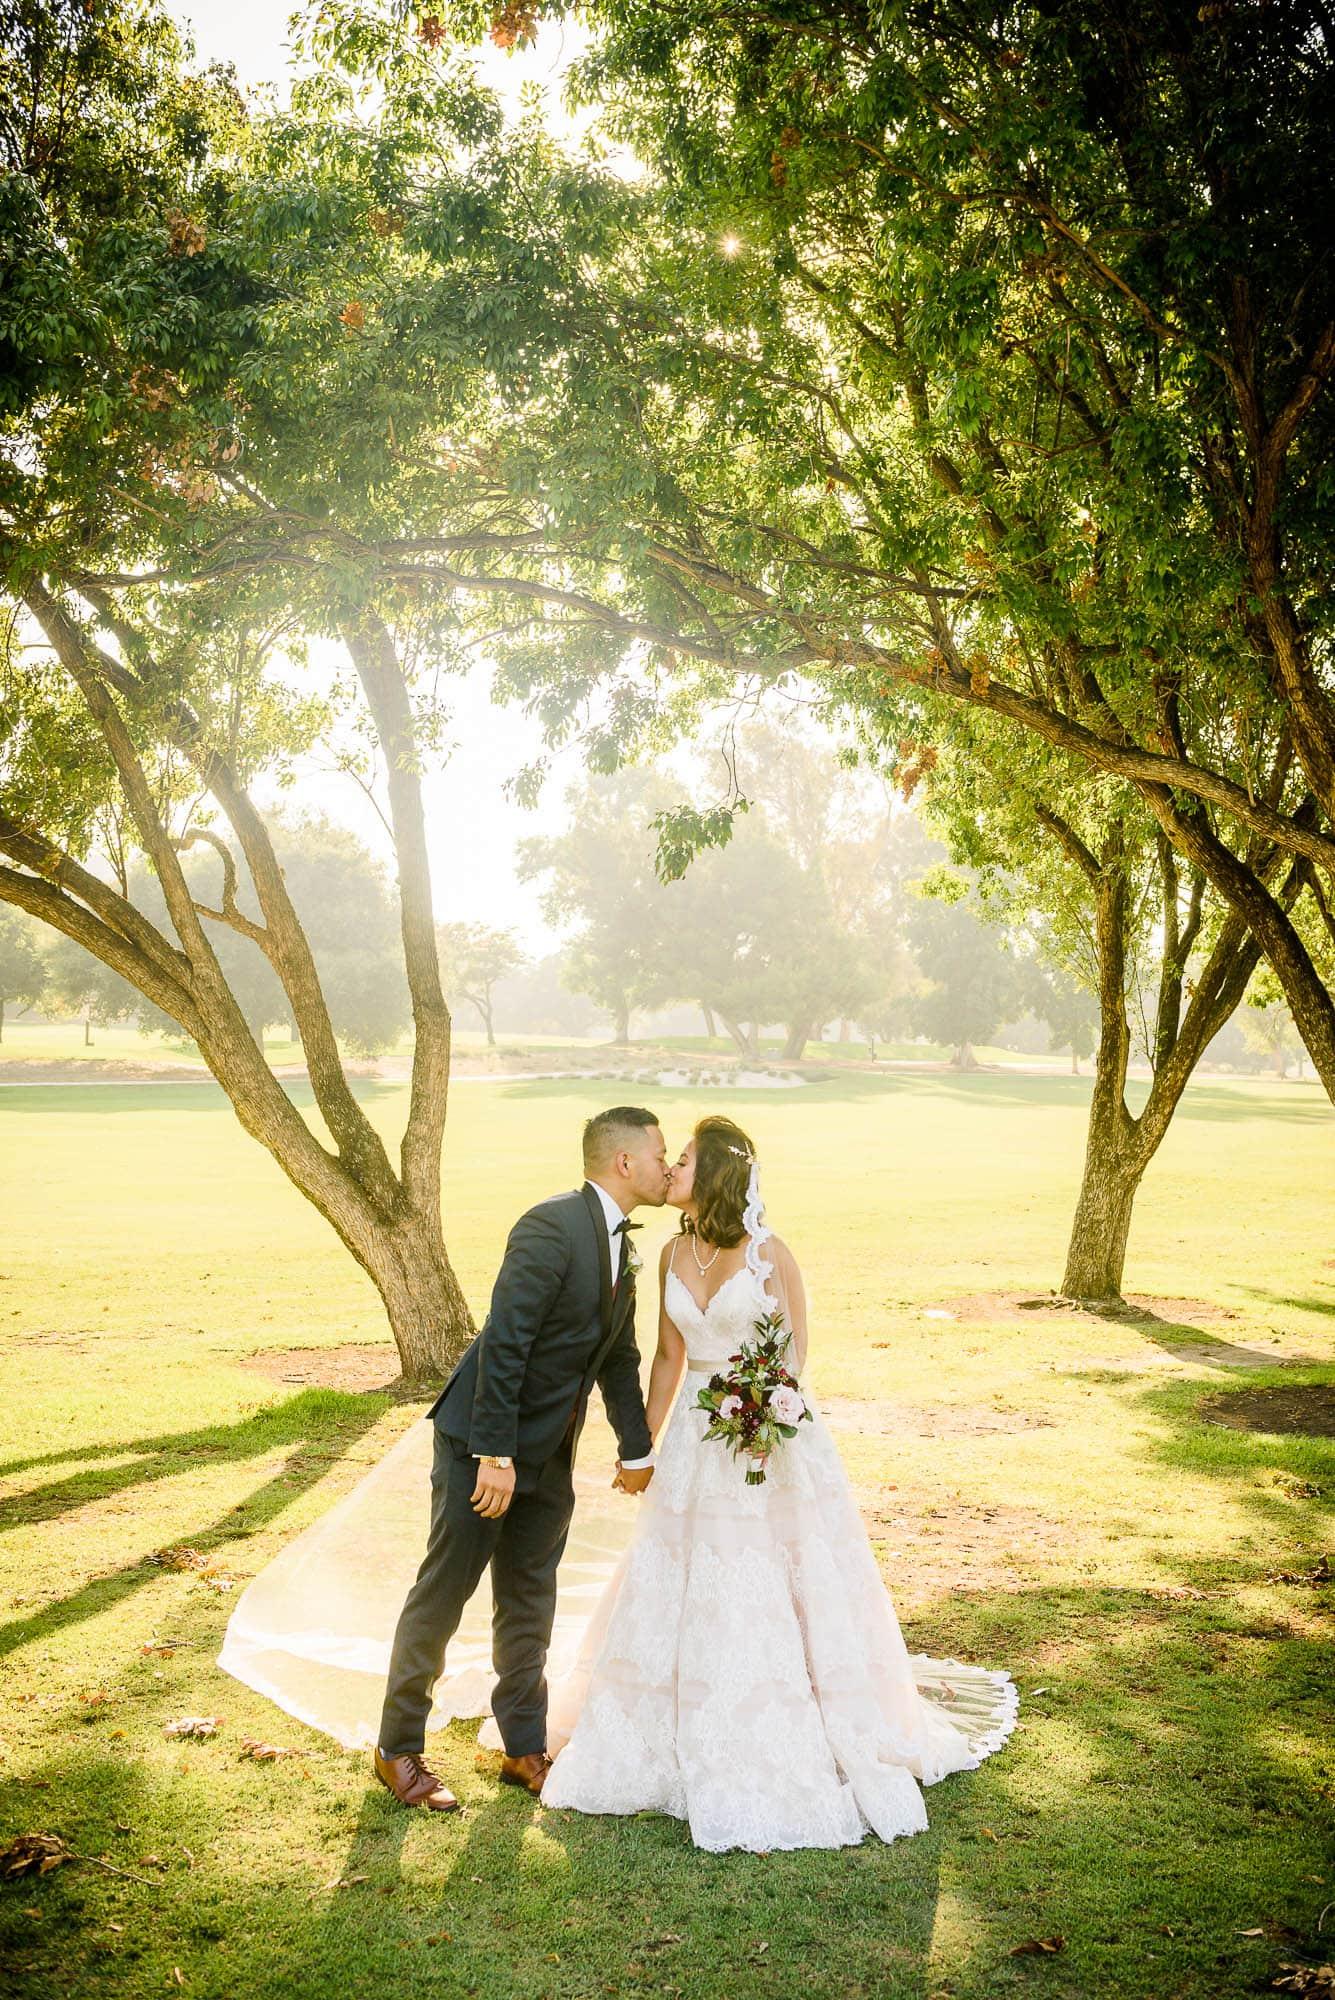 Alan & Heidi Bride Groom Field Kissing